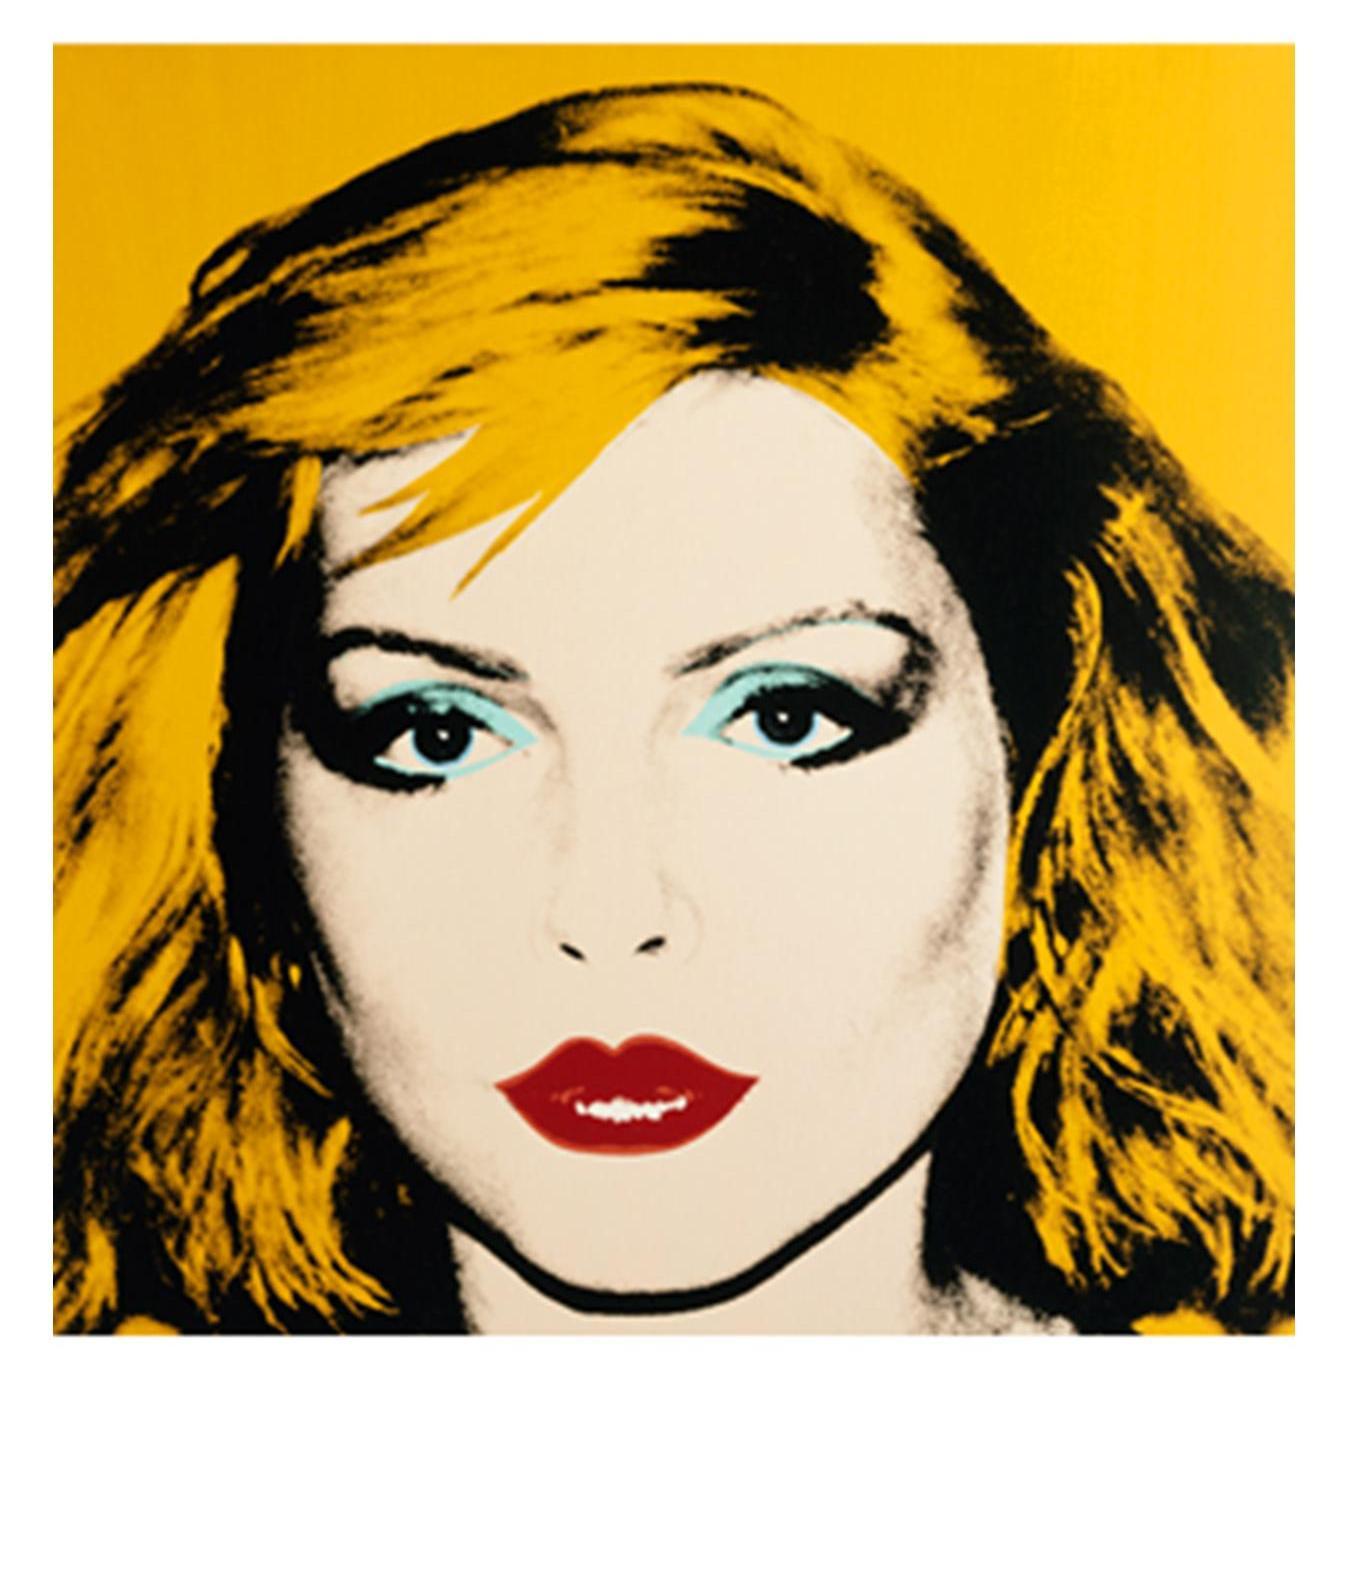 http://1.bp.blogspot.com/-n9bXpKGVzOM/T6x_4GVojFI/AAAAAAAAAUY/ADno6fCzjGs/s1600/Blondie-Andy+Warhol+Screen+Print.jpg